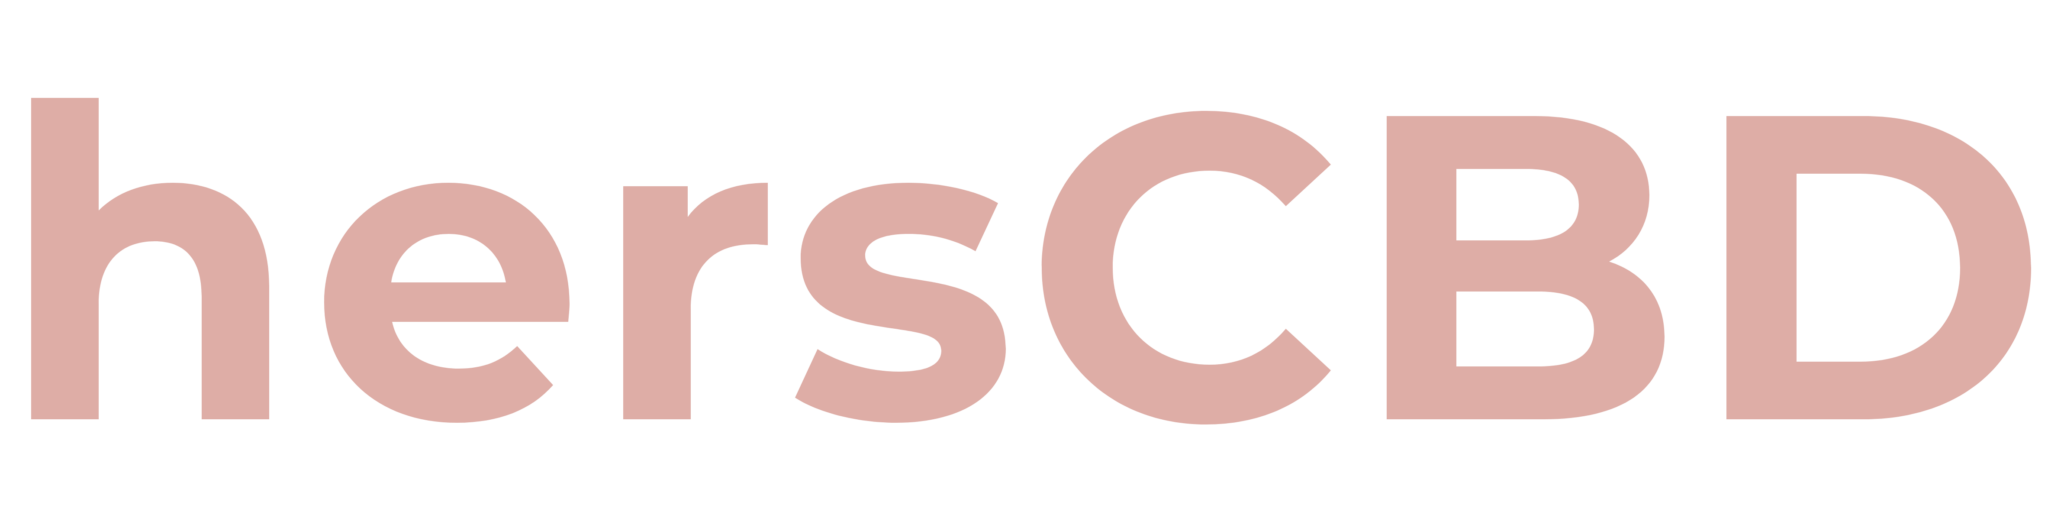 hersCBD